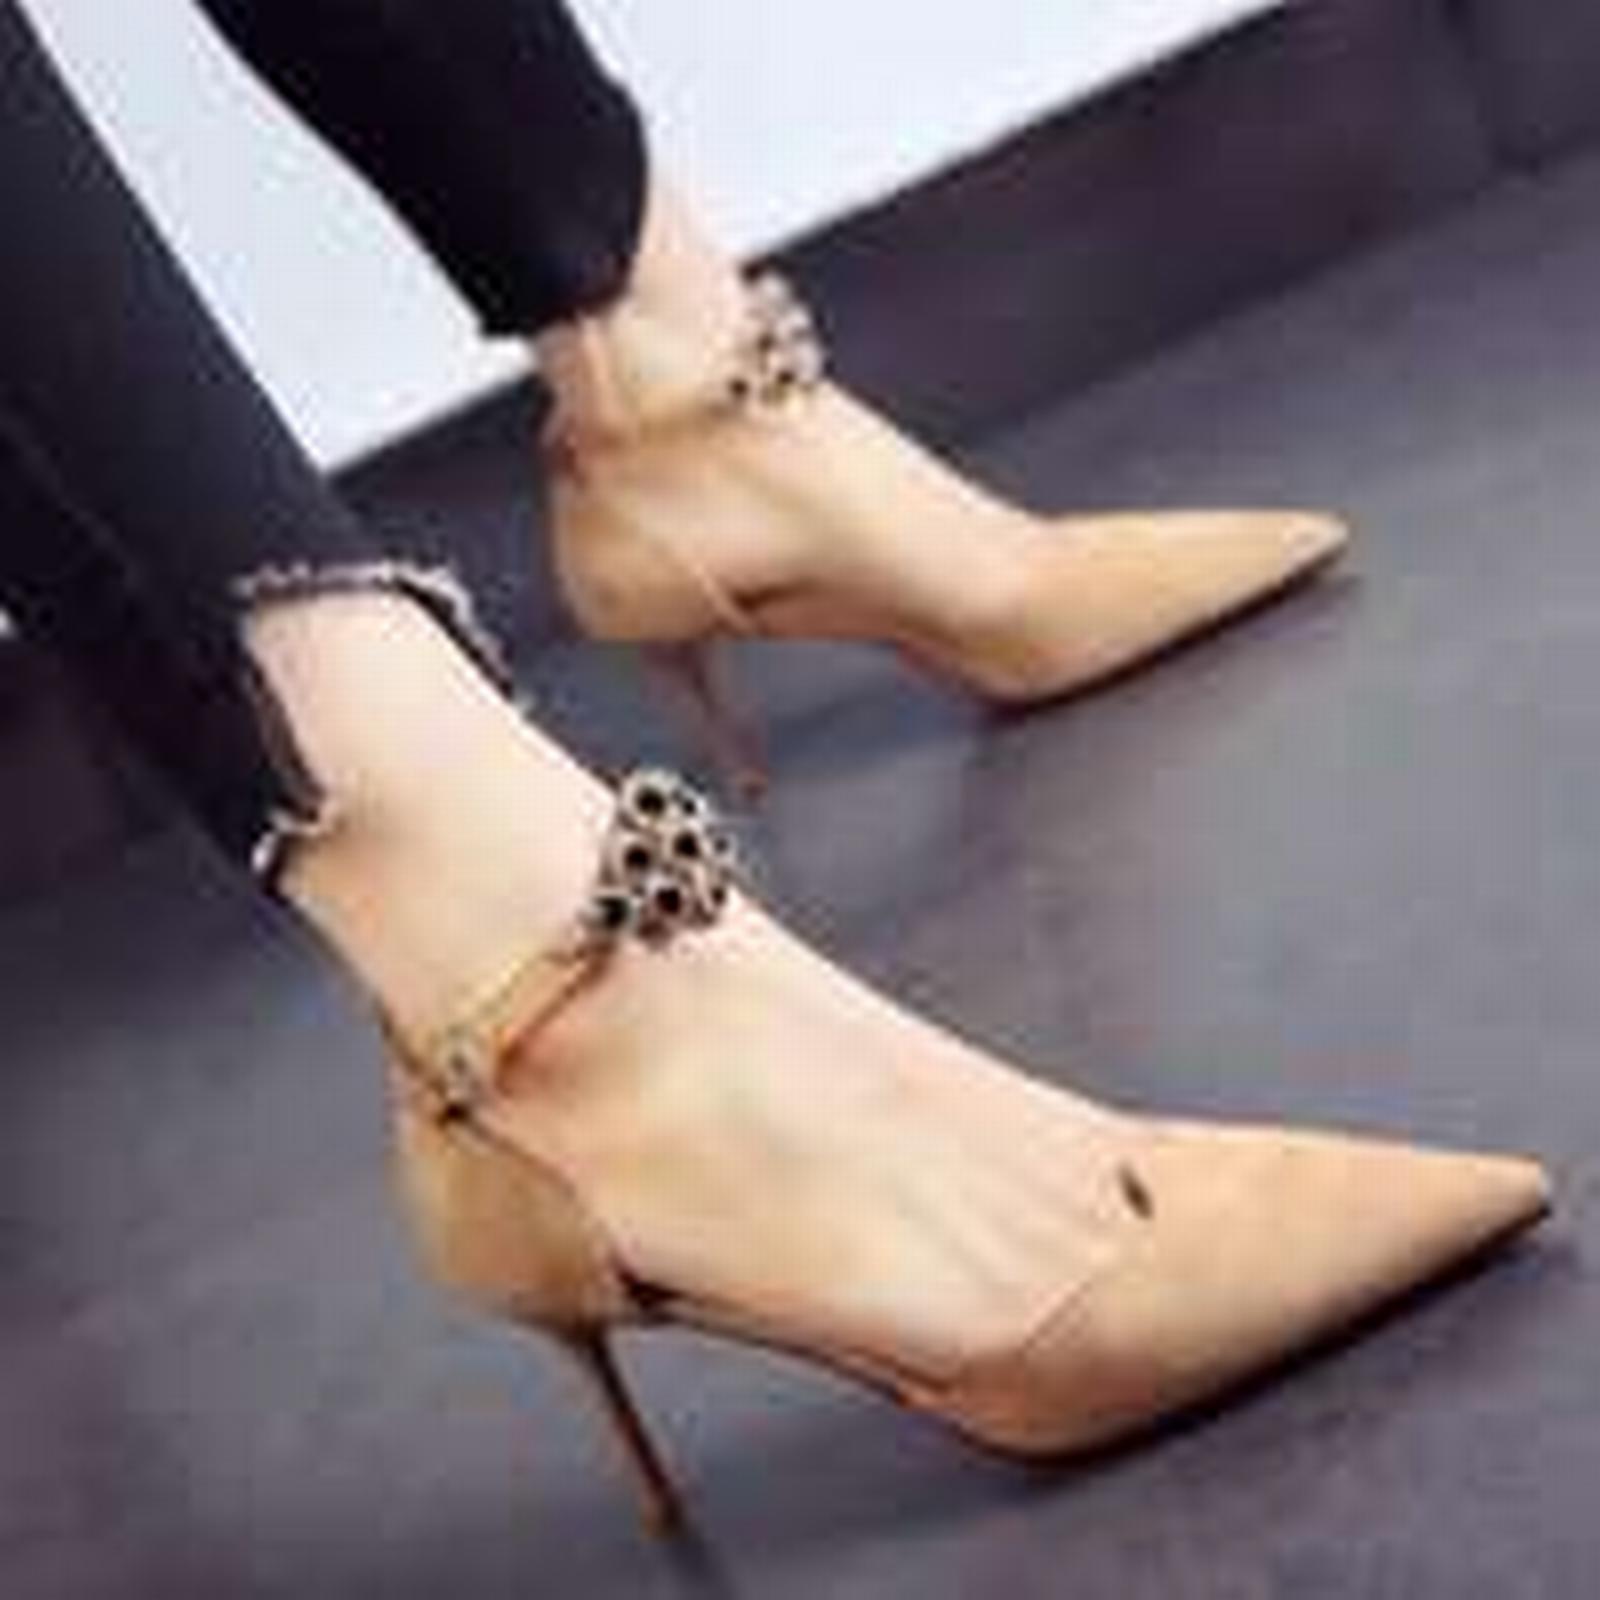 Bonanza (Global) strap pp363 Sweet slides ankle strap (Global) pump, red sole,US Size 4-8.5, apricot 2552a6